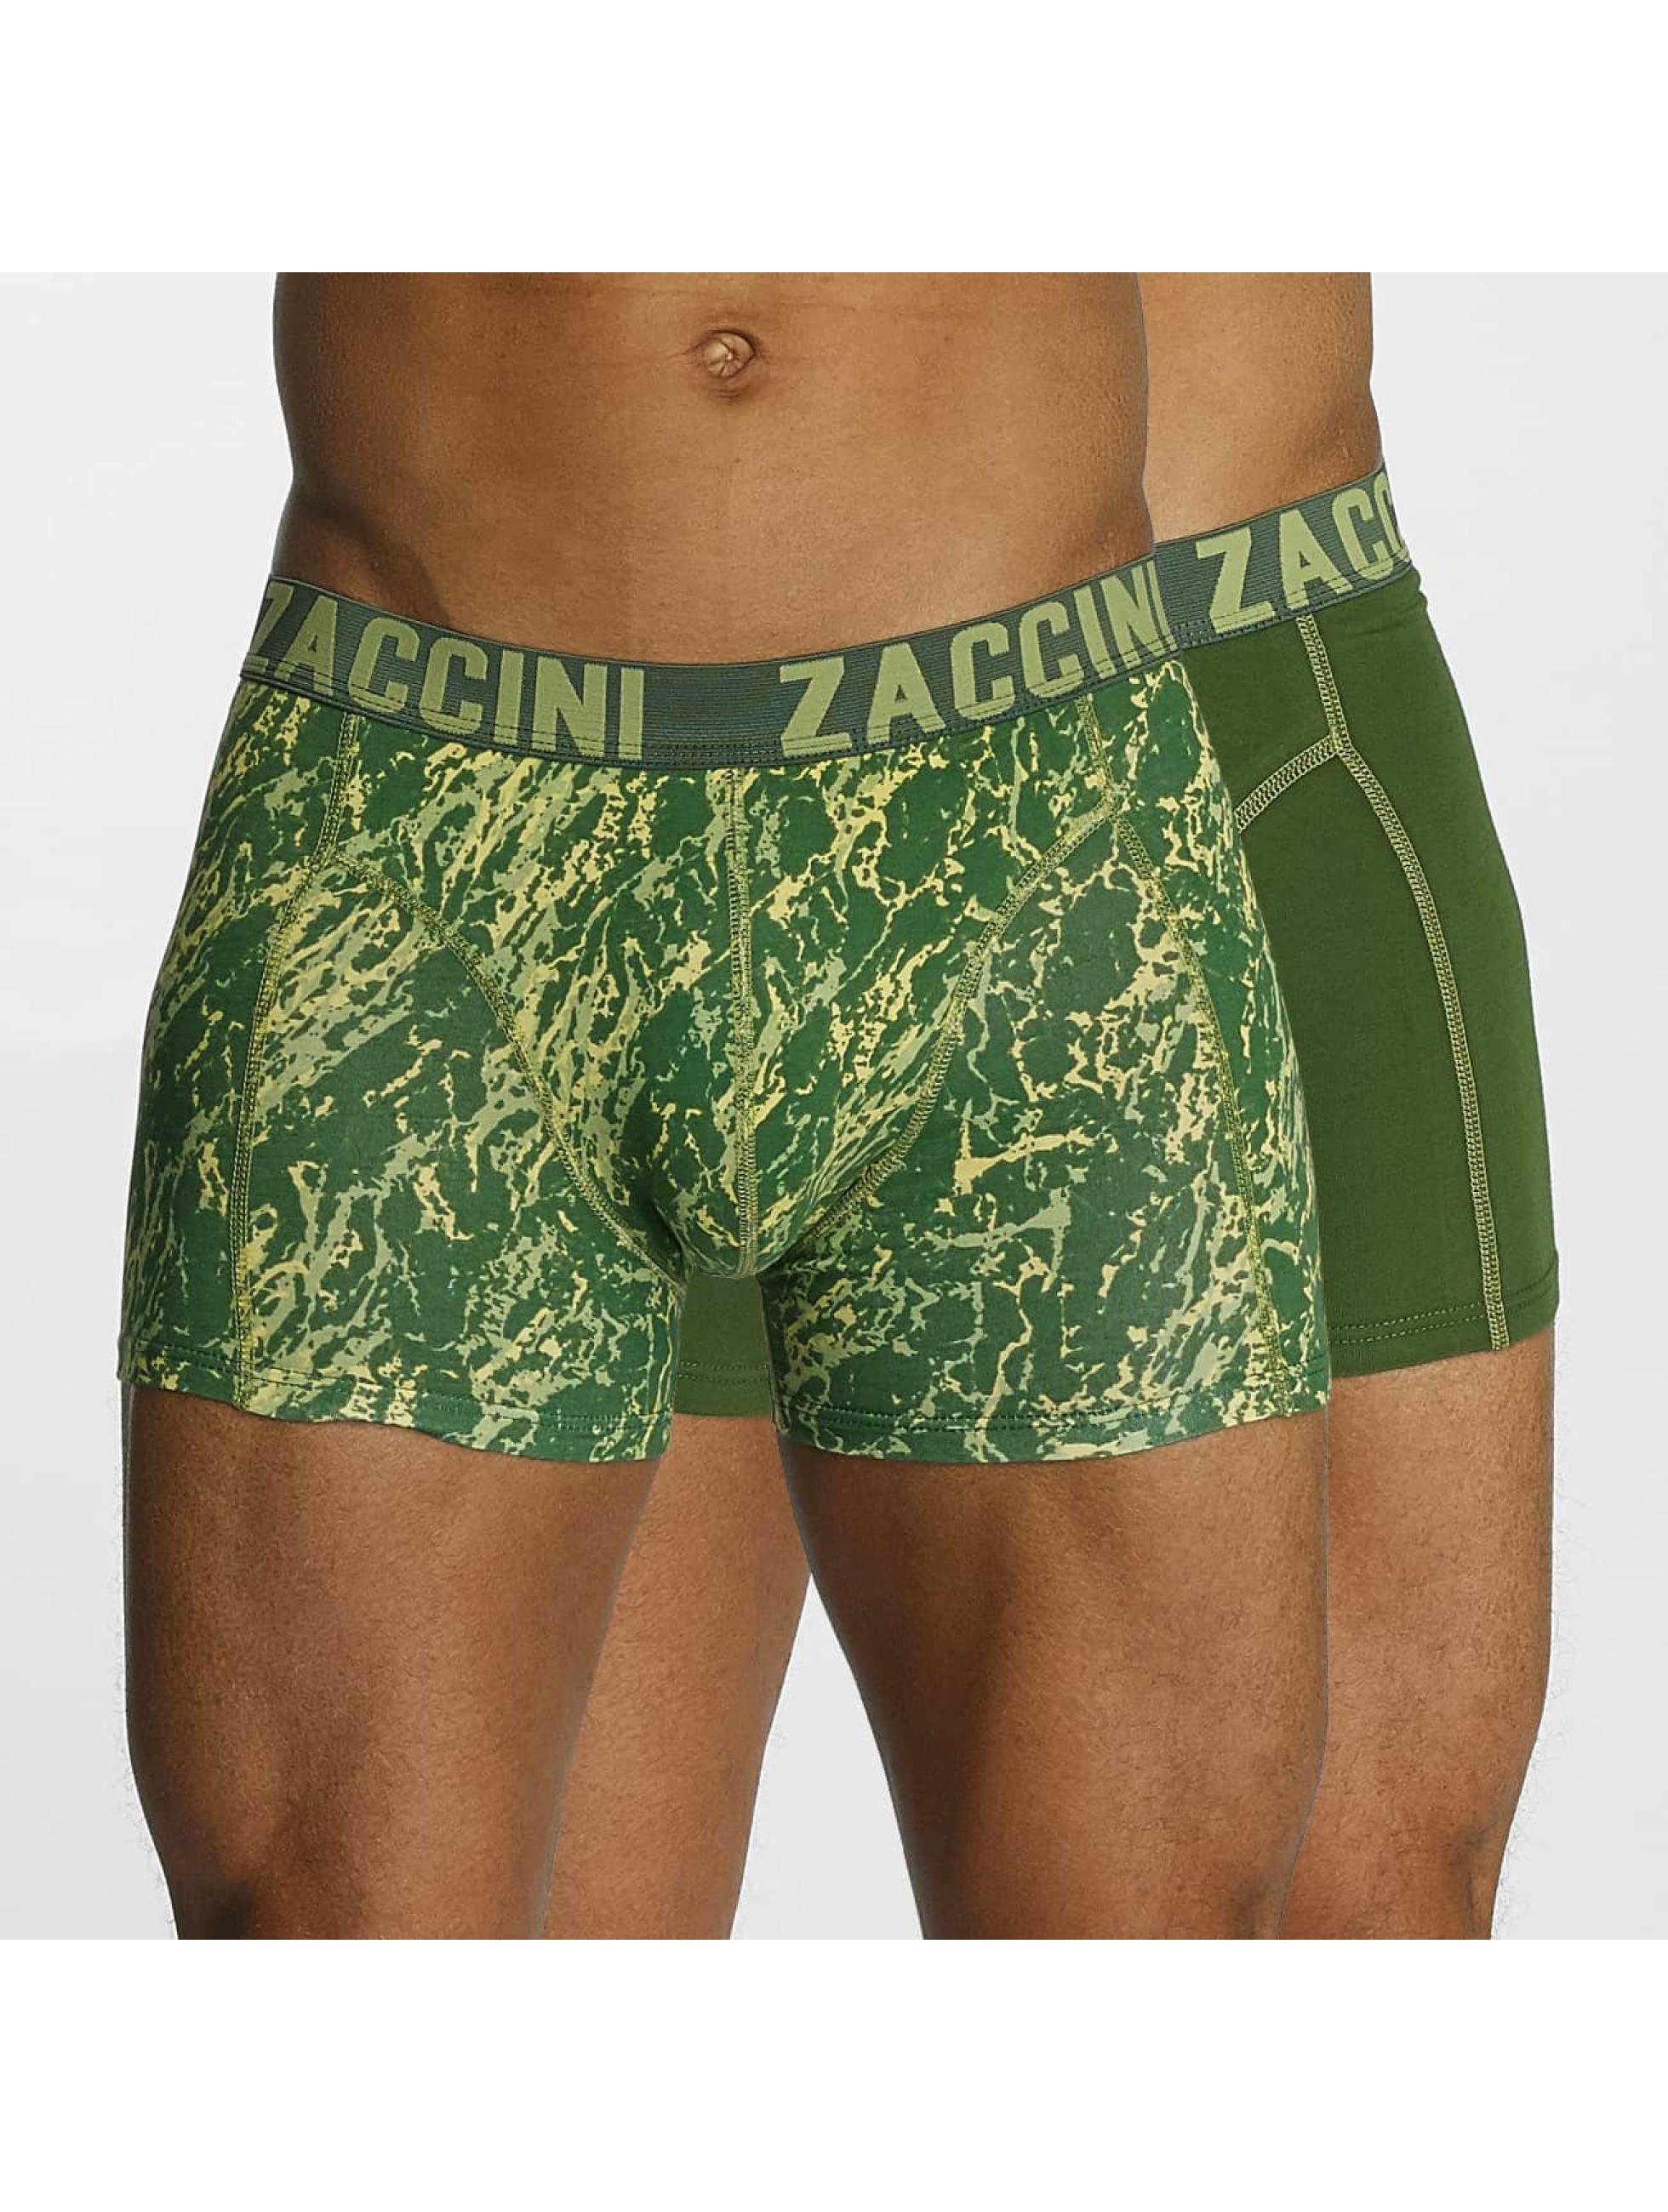 Zaccini Männer Boxershorts Mineral in grün